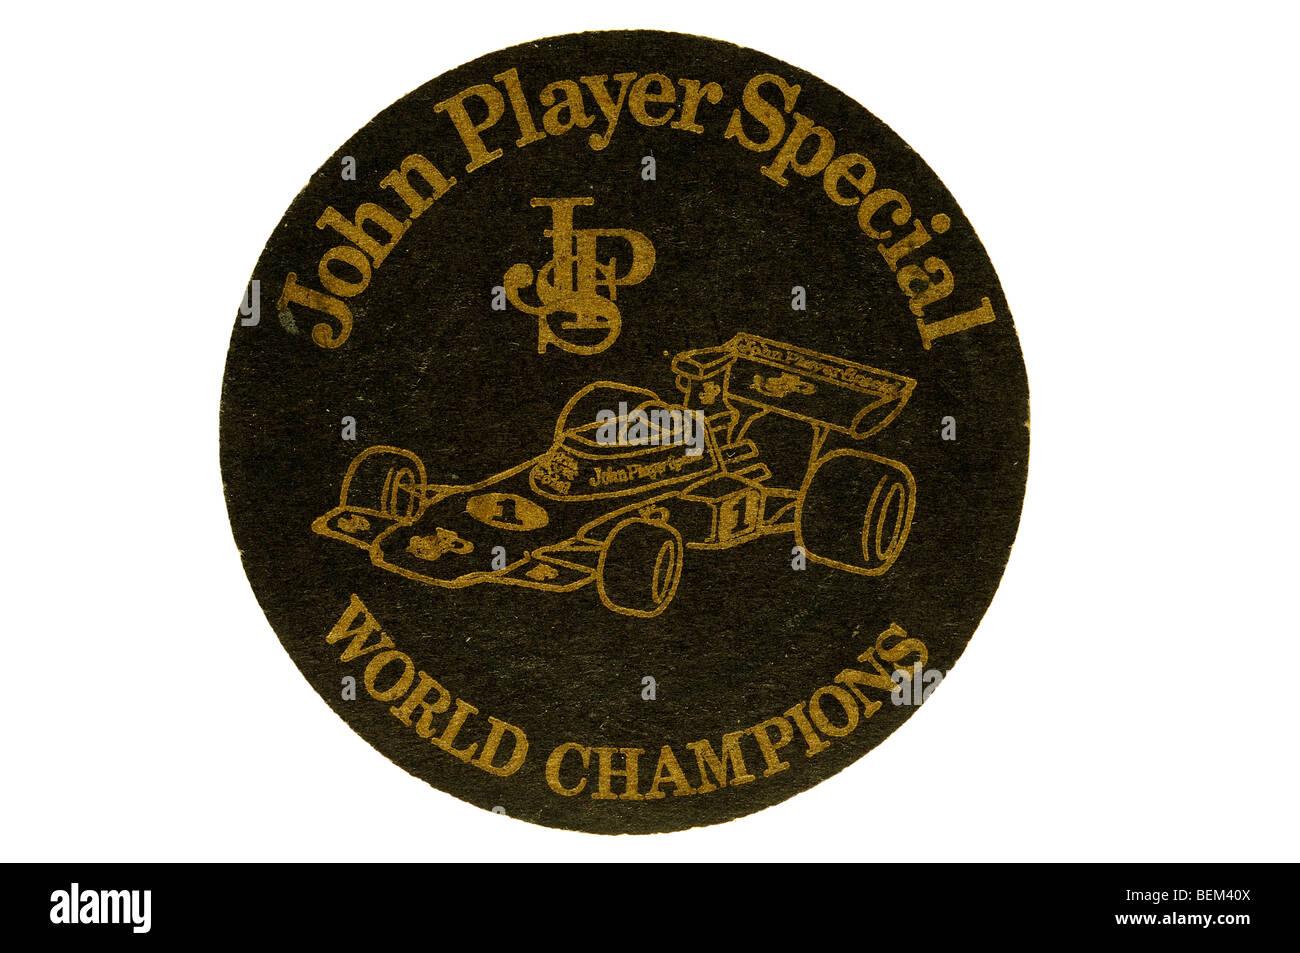 john player special JSP world championship - Stock Image